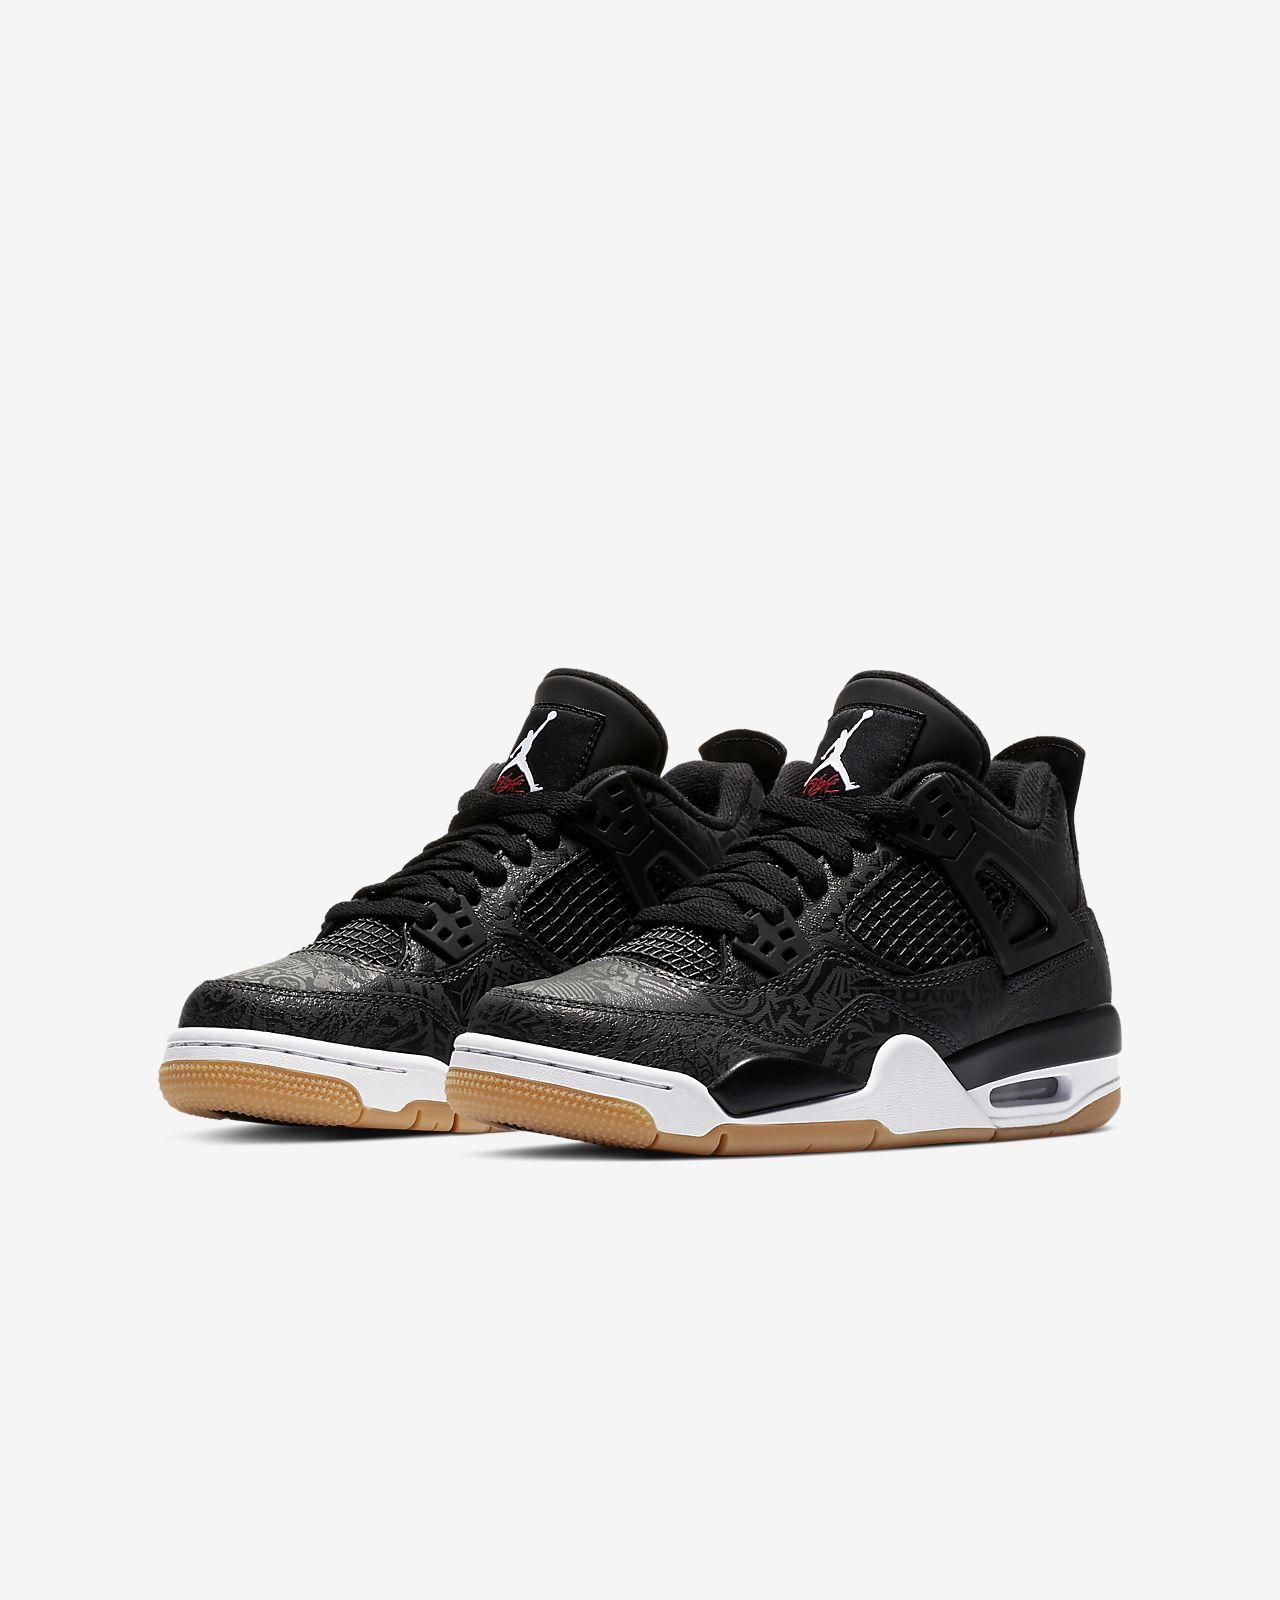 170594c58a2b Air Jordan 4 Retro SE Big Kids  Shoe. Nike.com